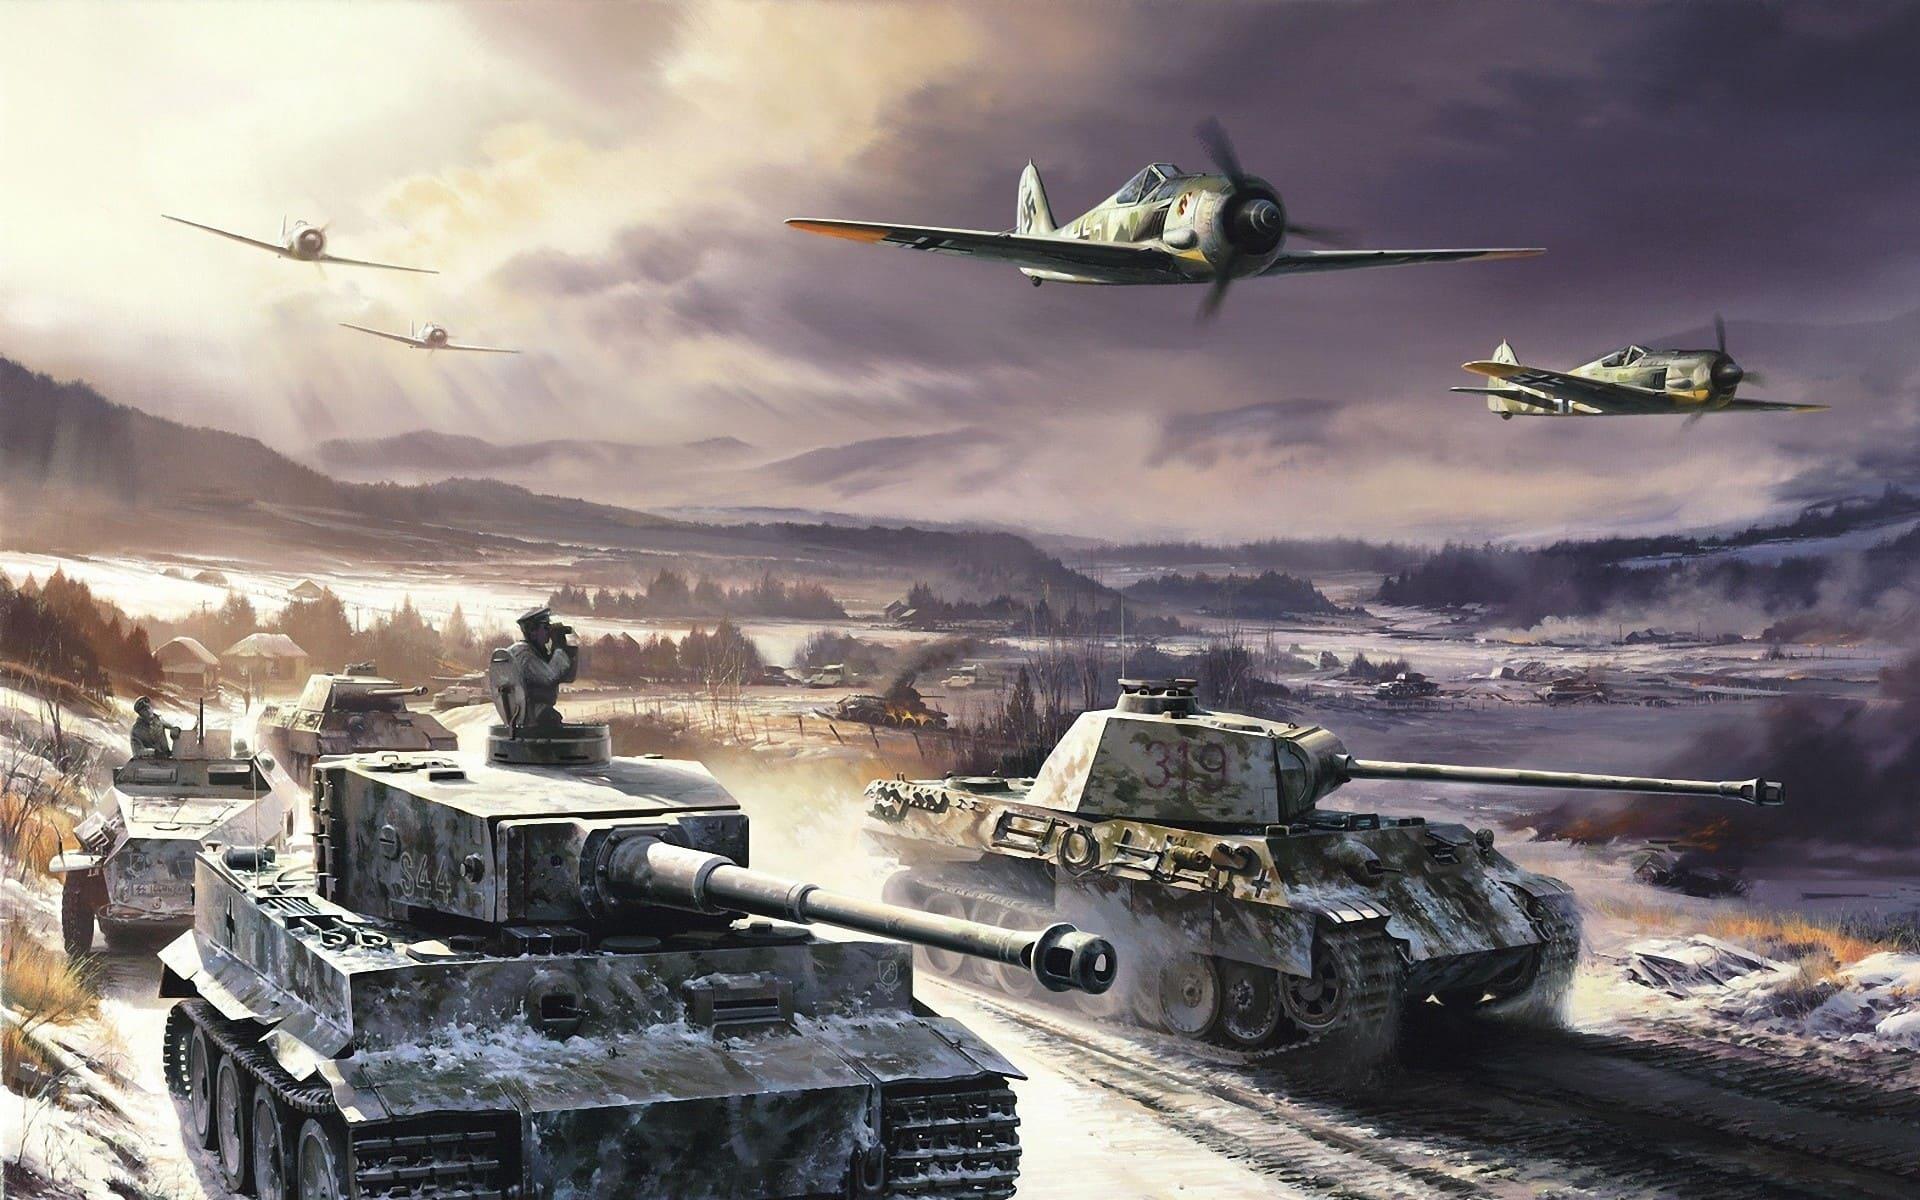 War thunder best planes 2020